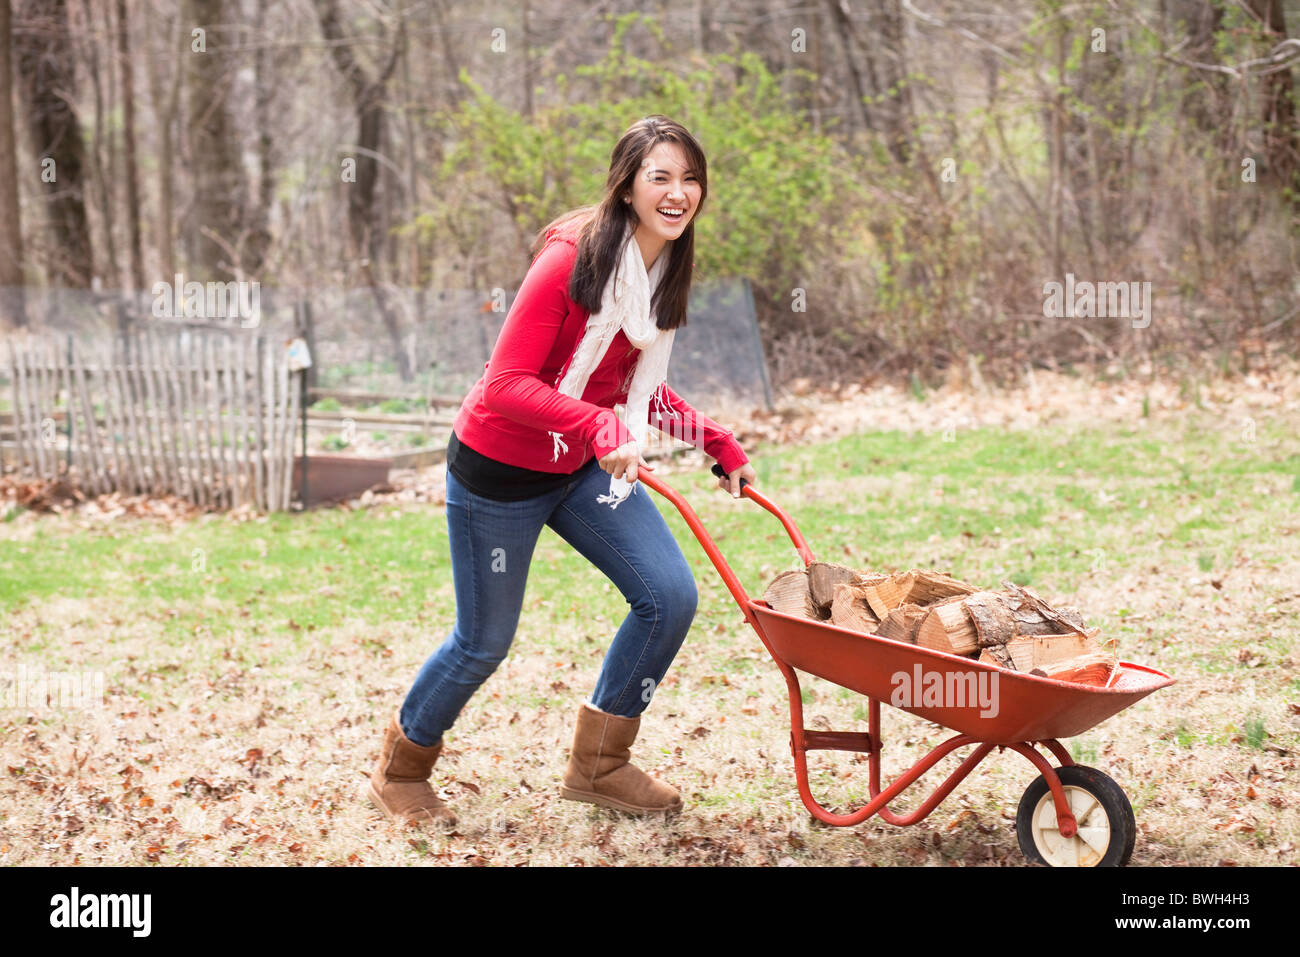 Girl pushing wheelbarrow - Stock Image